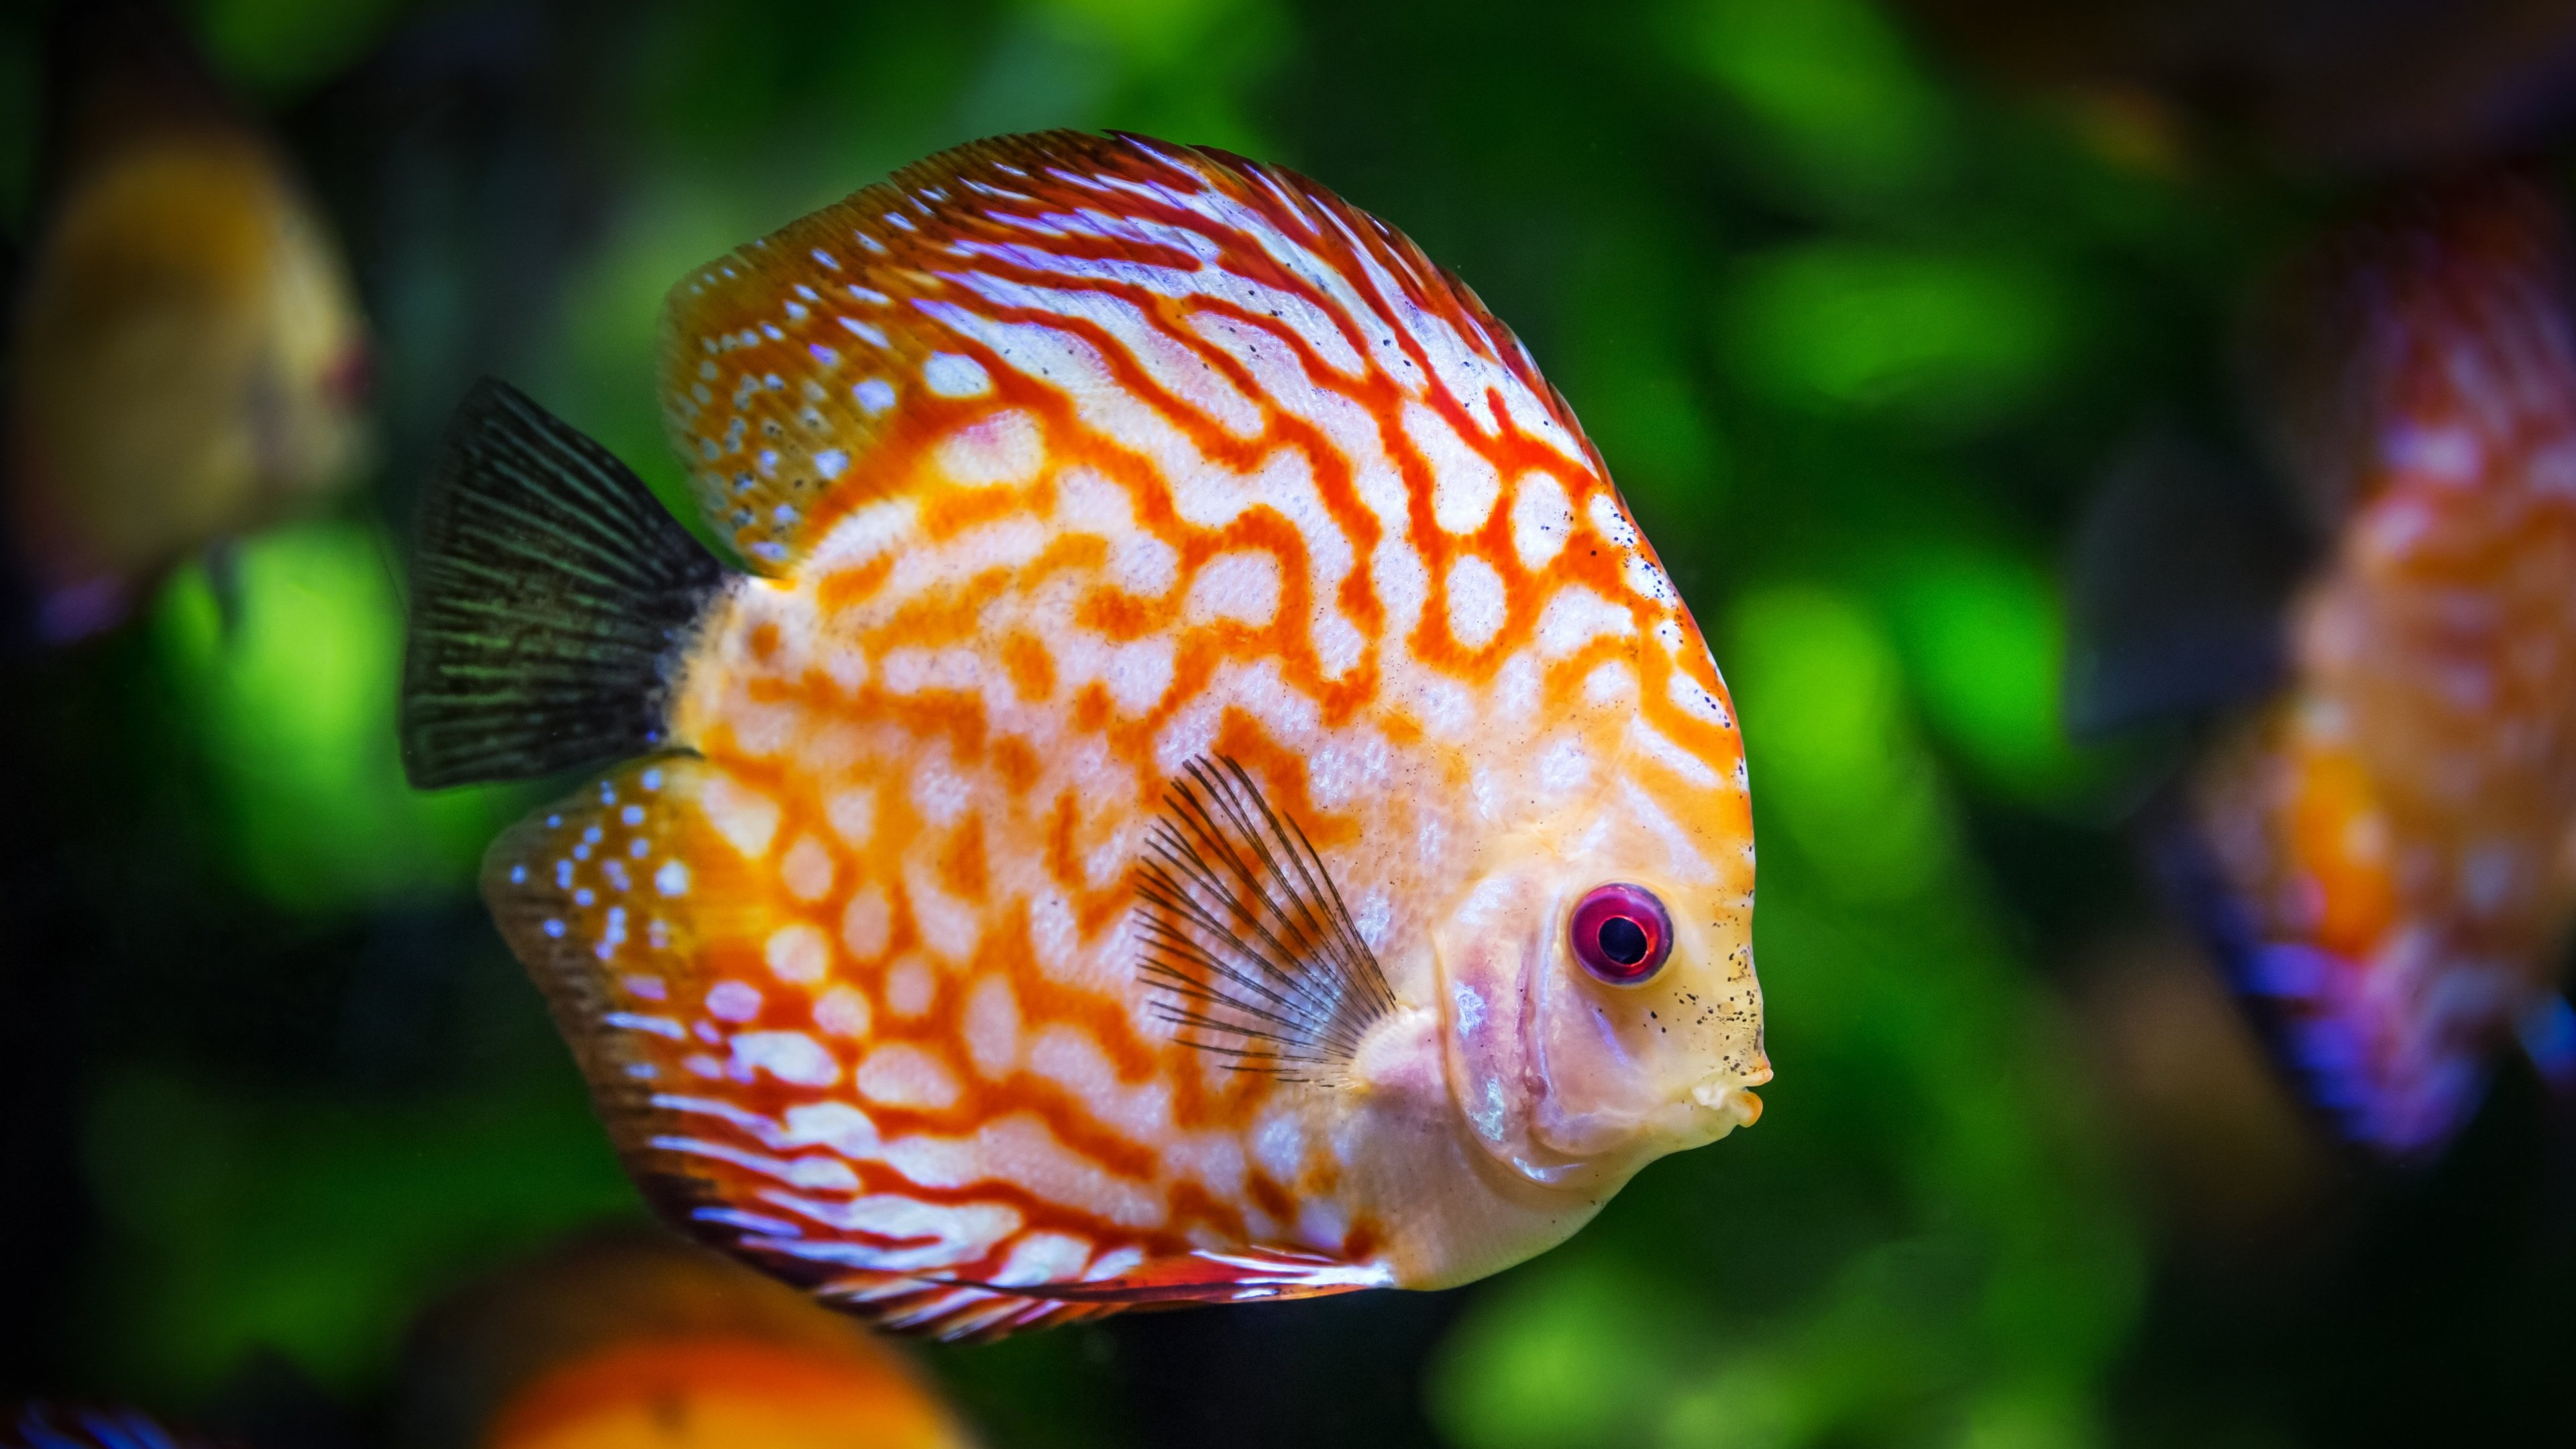 Must see Wallpaper Mobile Fish - 24_wide  Image_47585.jpg